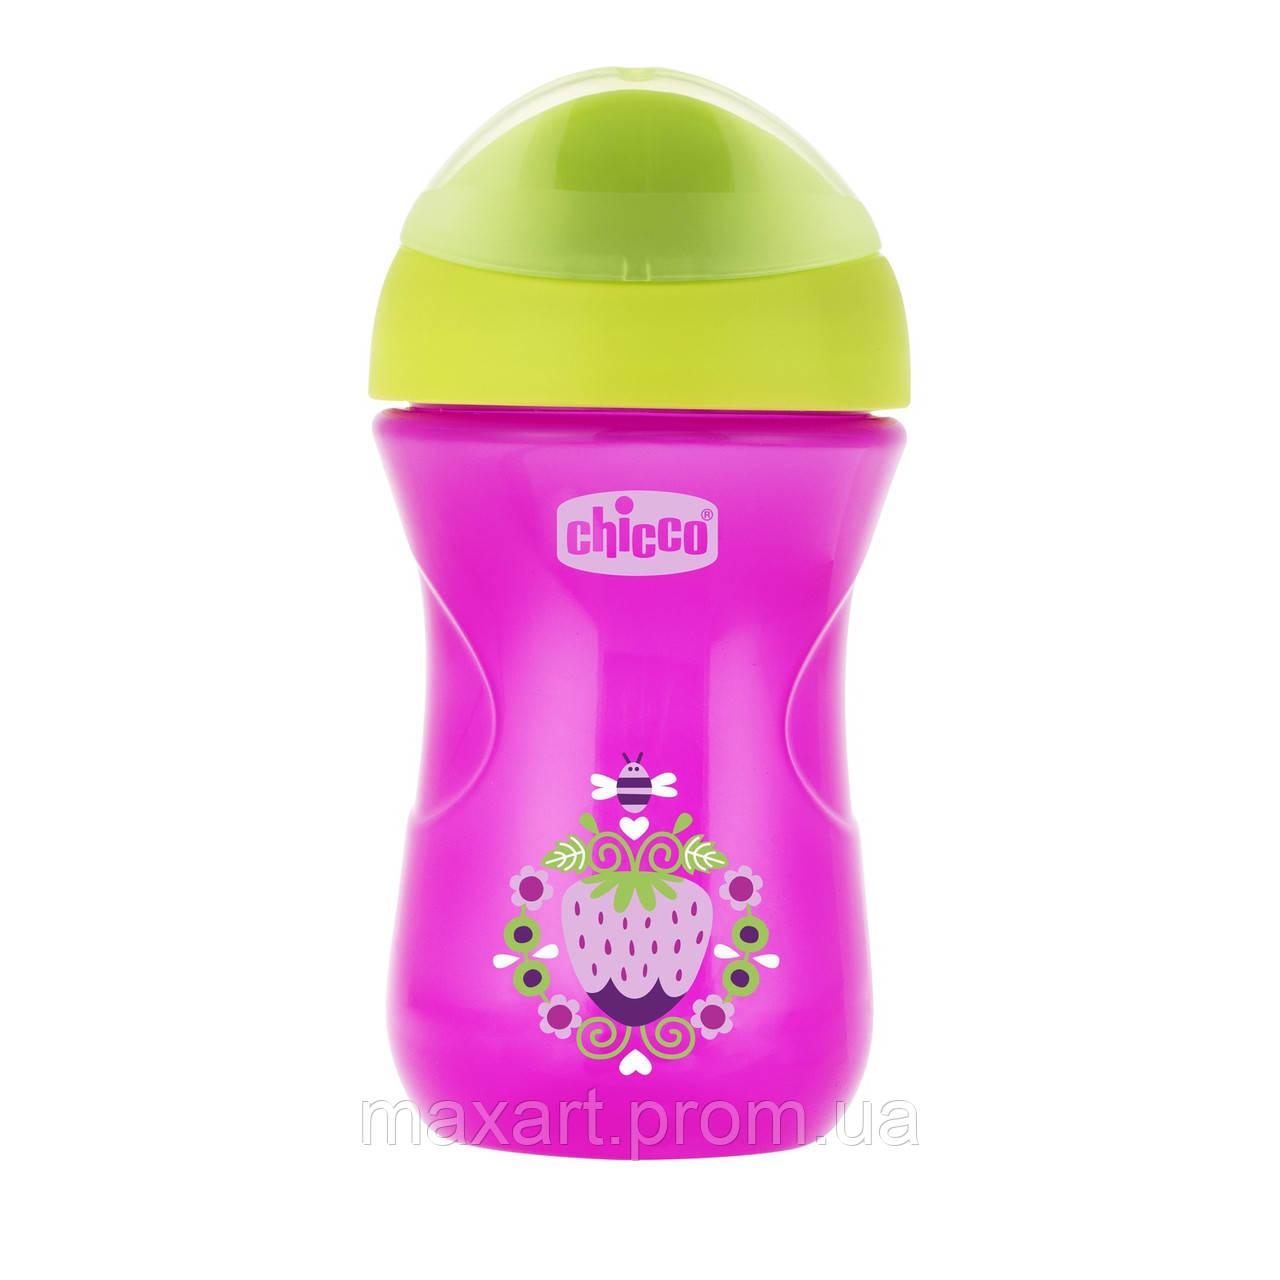 Чашка-непроливайка Chicco - Easy Cup (06961.10P) 266 мл / 12 мес.+ / розовый